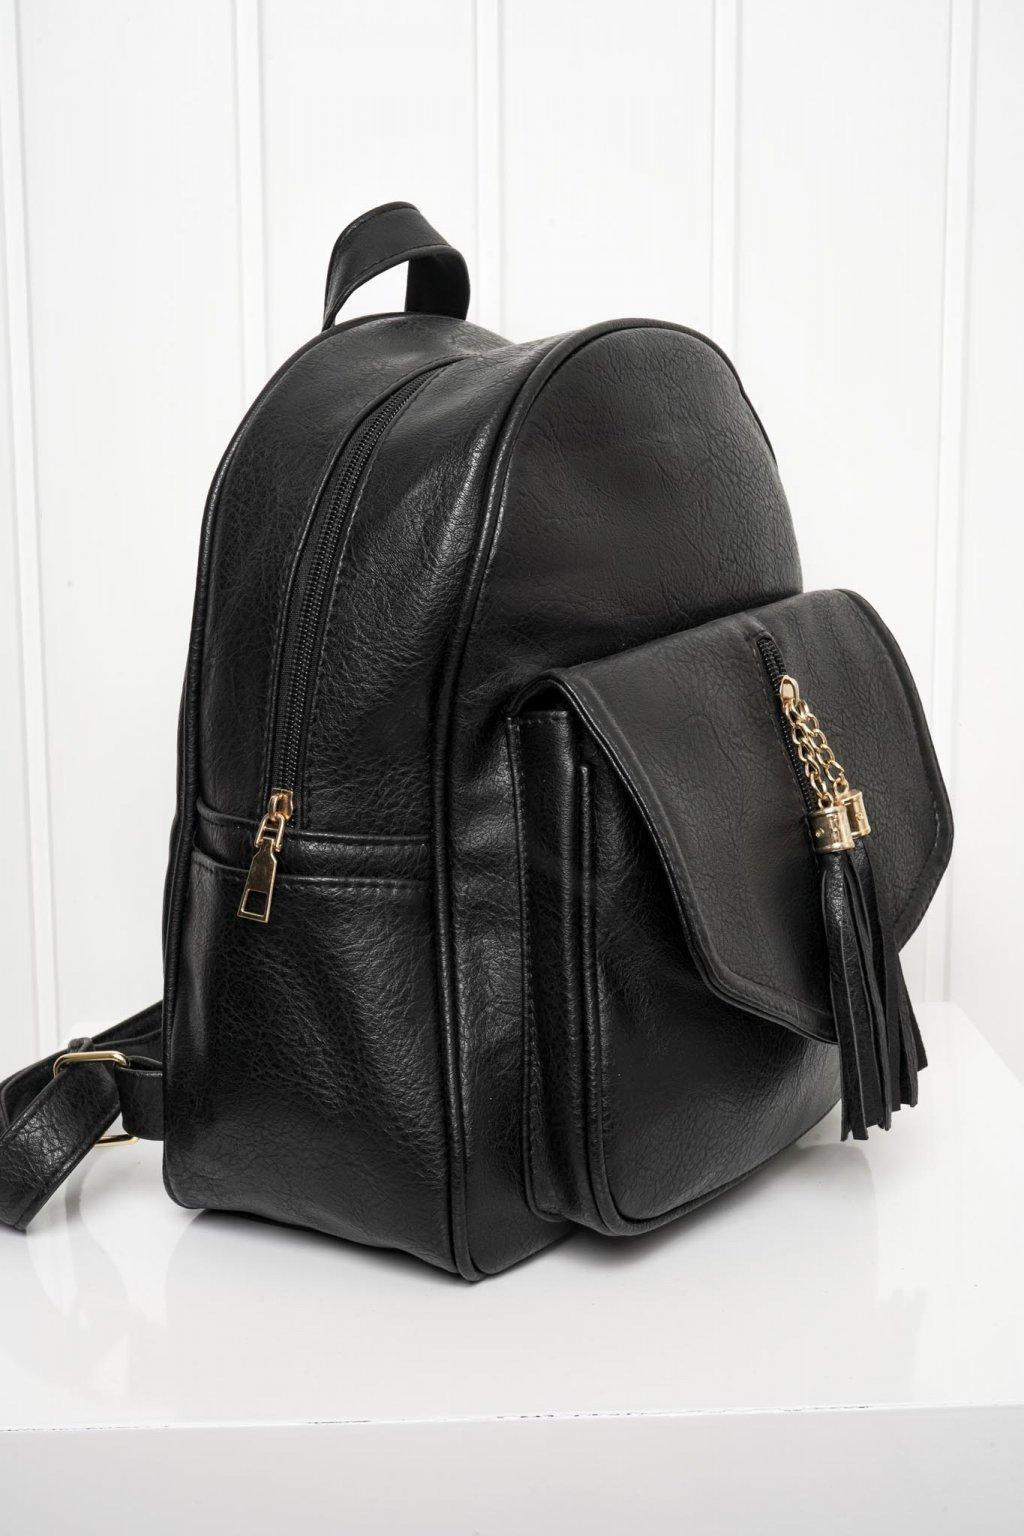 Kabelka, crossbody, ruksak, shopping bag, shopperka, 509